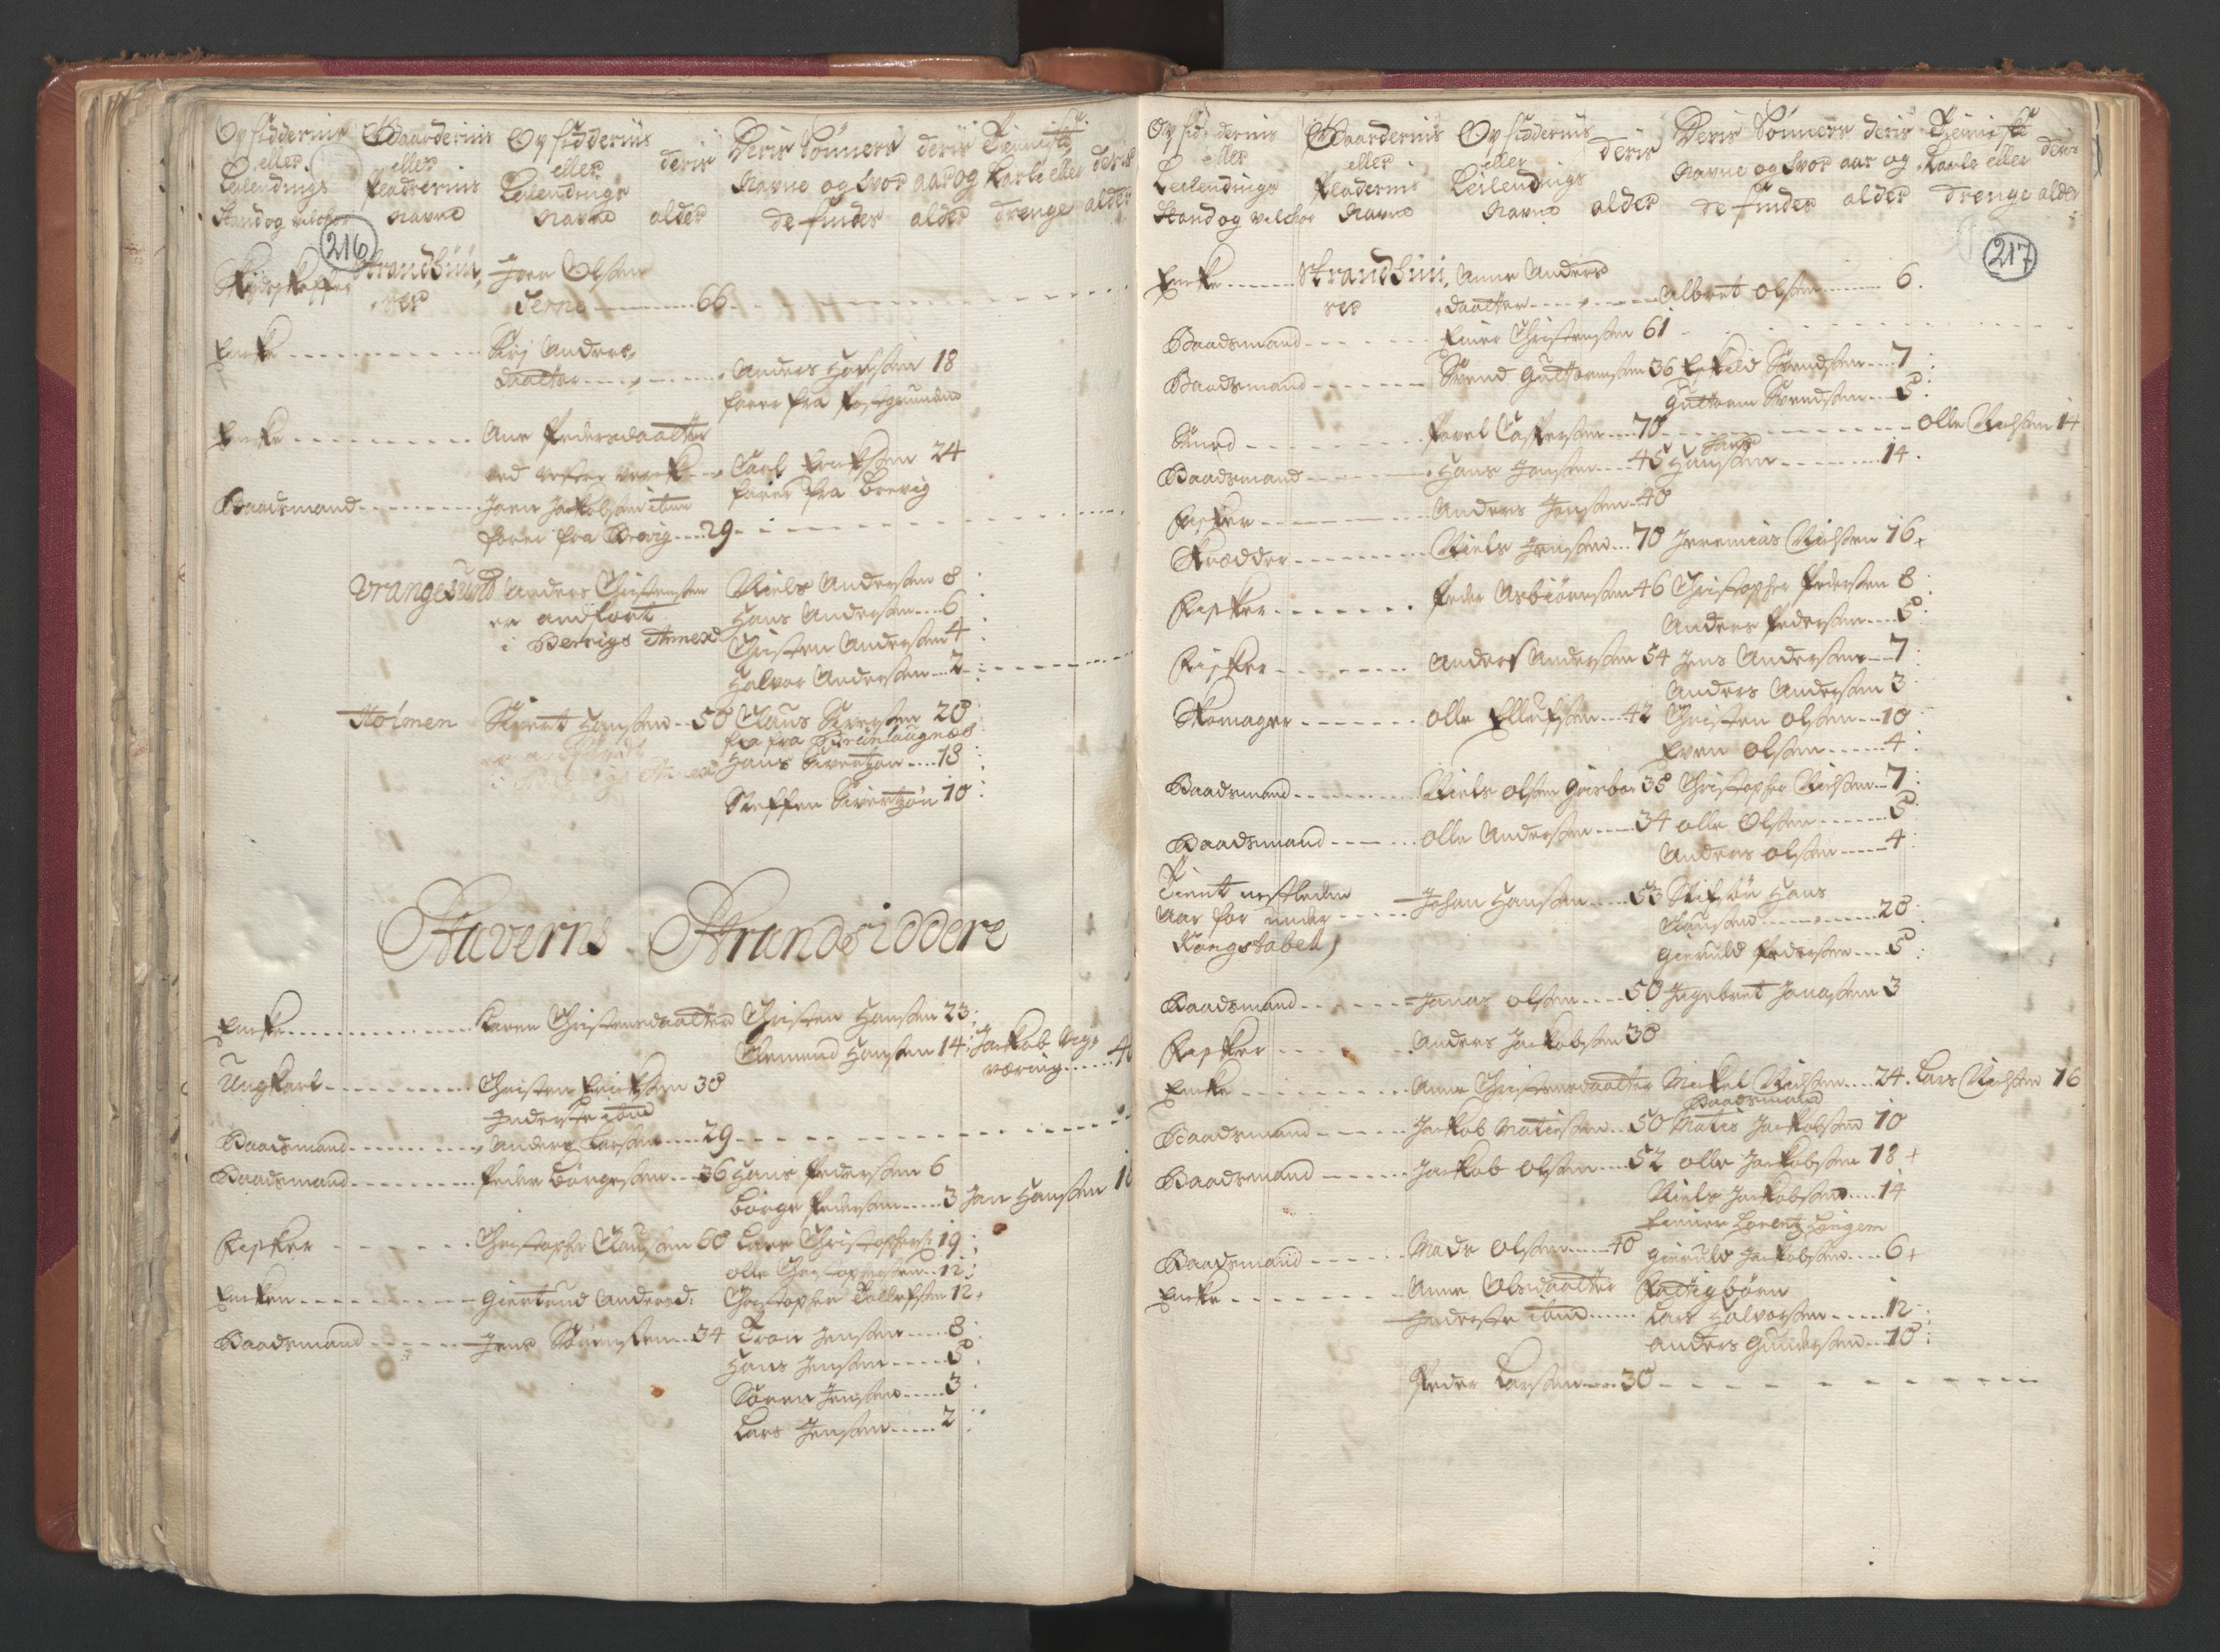 RA, Manntallet 1701, nr. 2: Solør, Odal og Østerdal fogderi og Larvik grevskap, 1701, s. 216-217